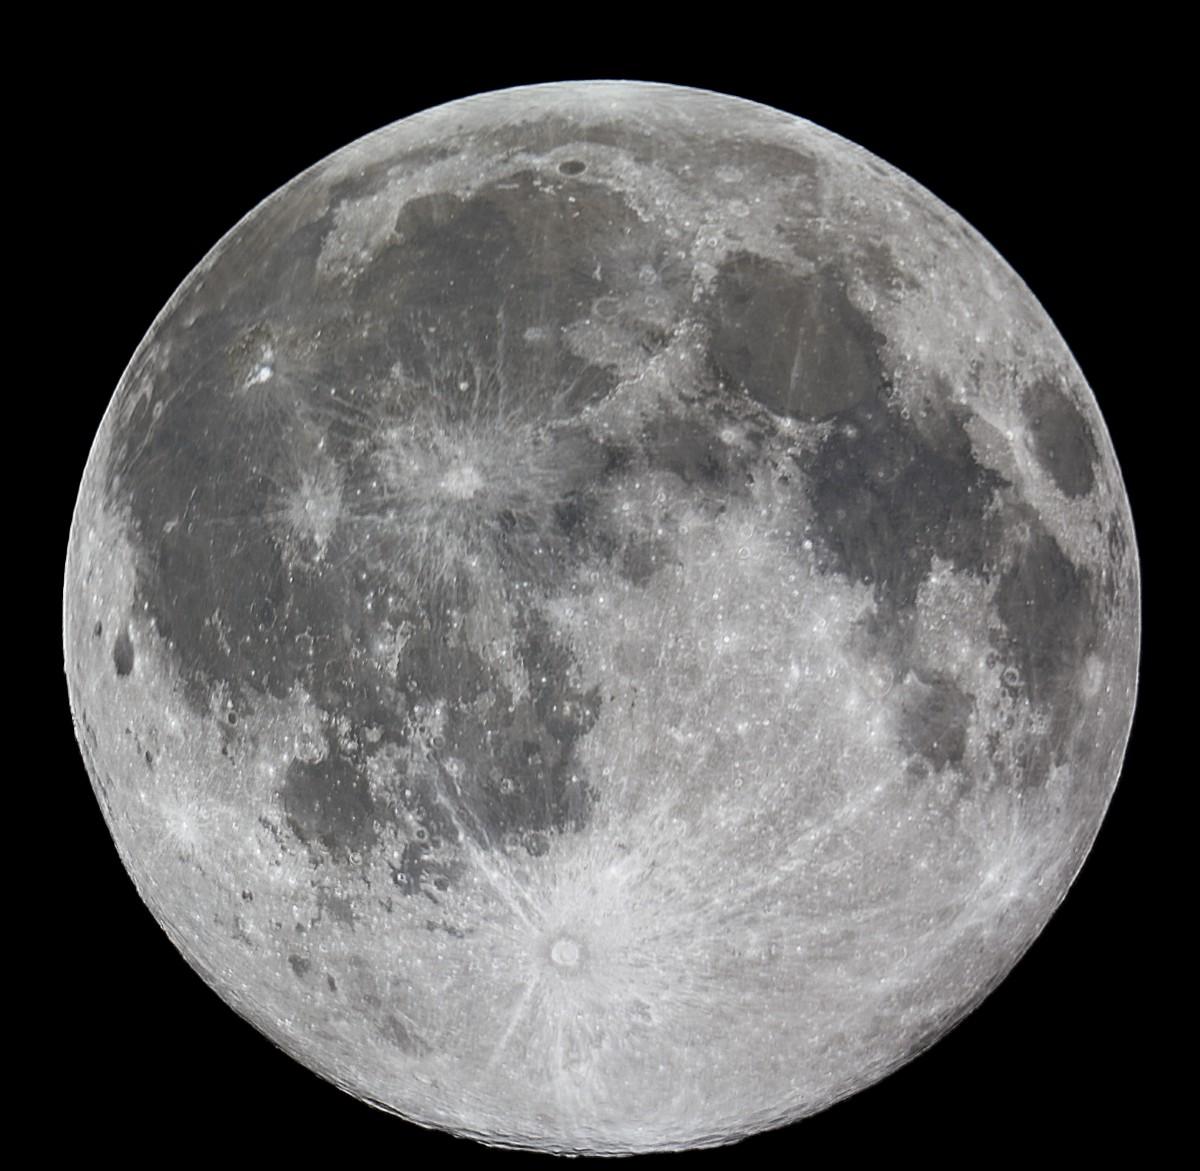 60cmドブソニアン自作記(145)梅雨の中休みに満月を撮る_a0095470_23583622.jpg